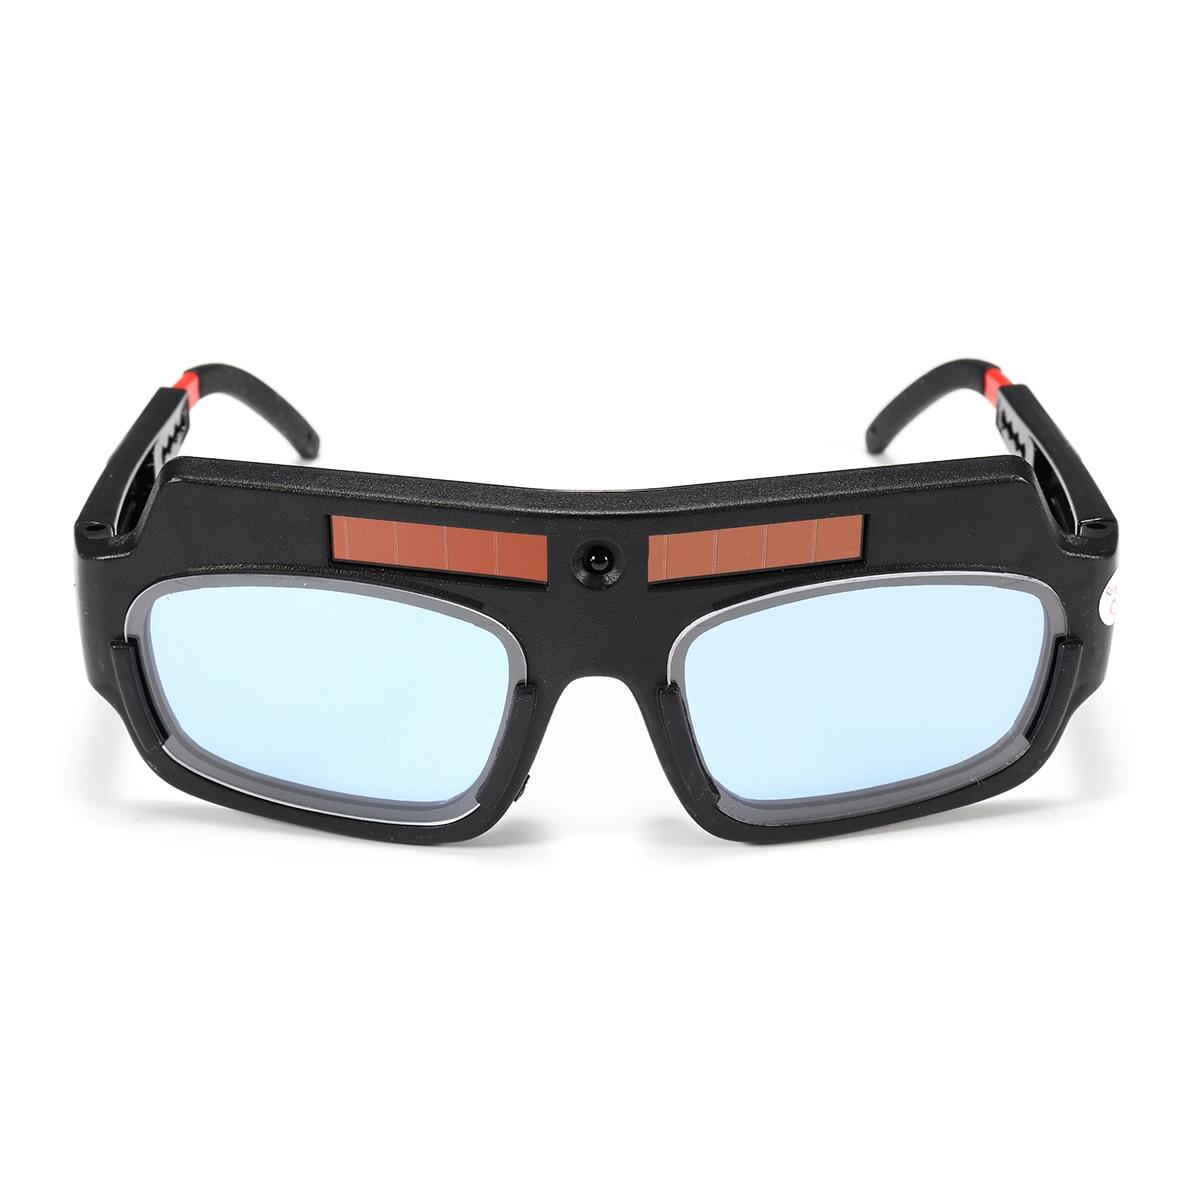 Safurance Solar Auto Darkening Welding Mask Helmet Eyes Goggle Welding Glasses Workplace Safety Eye Protection цена